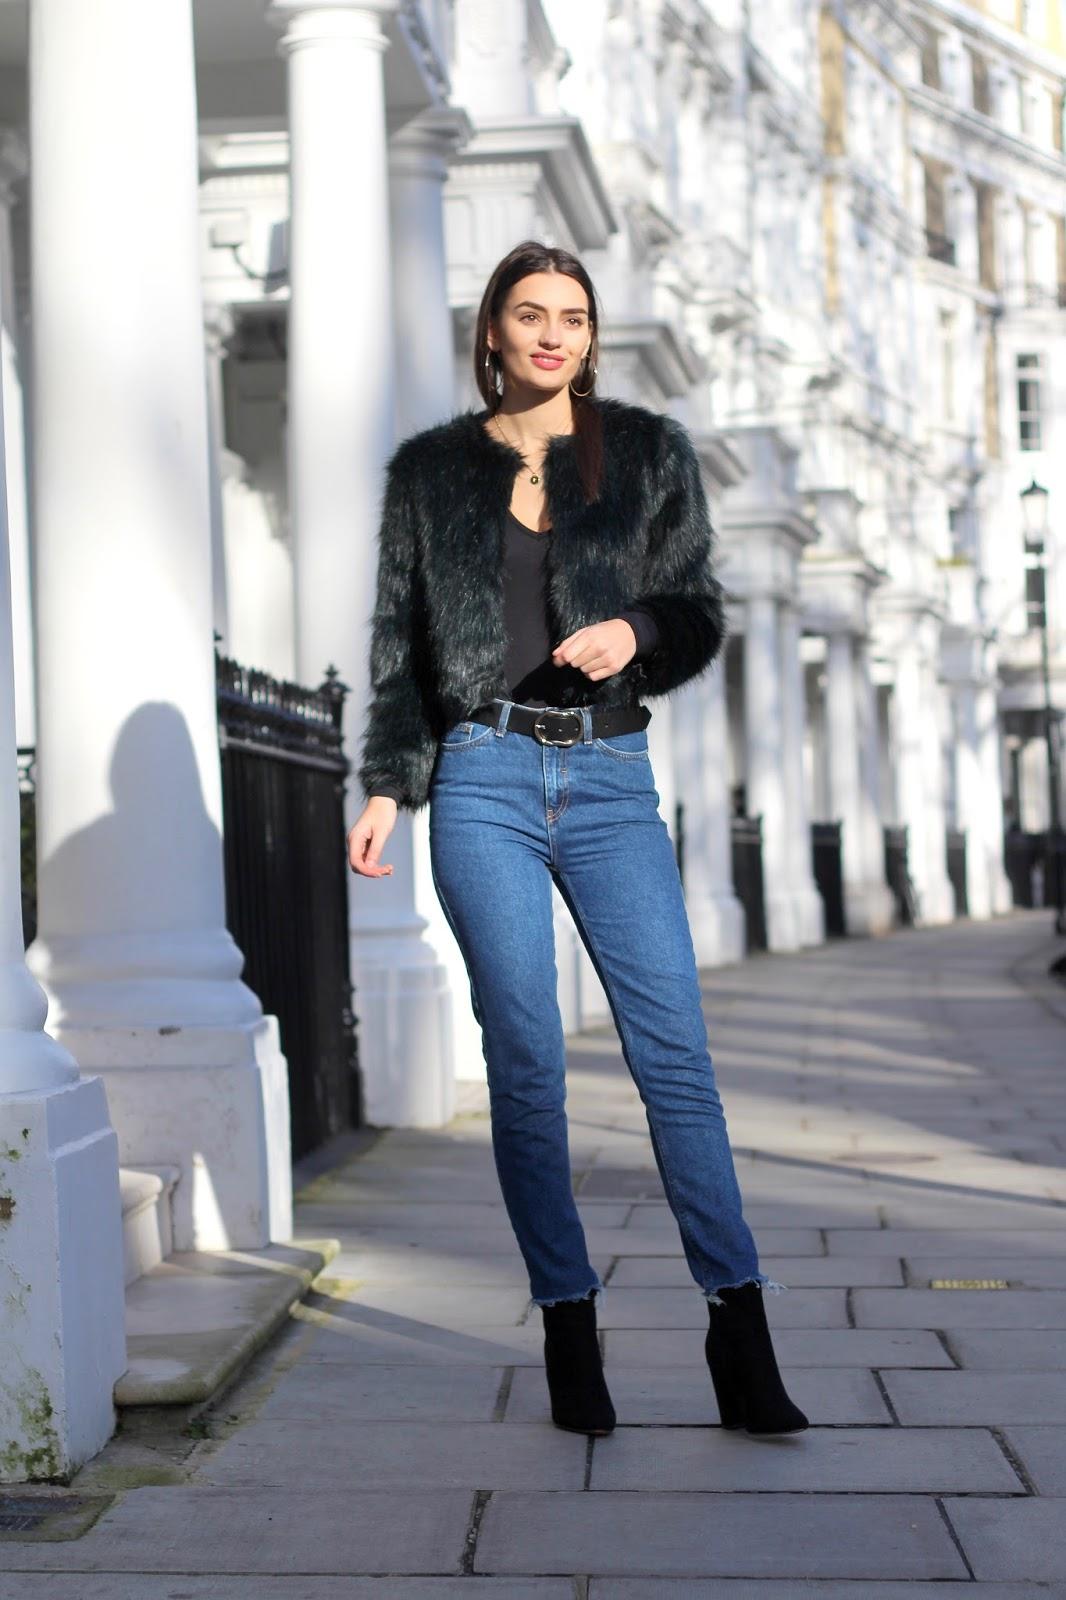 london style peexo blog